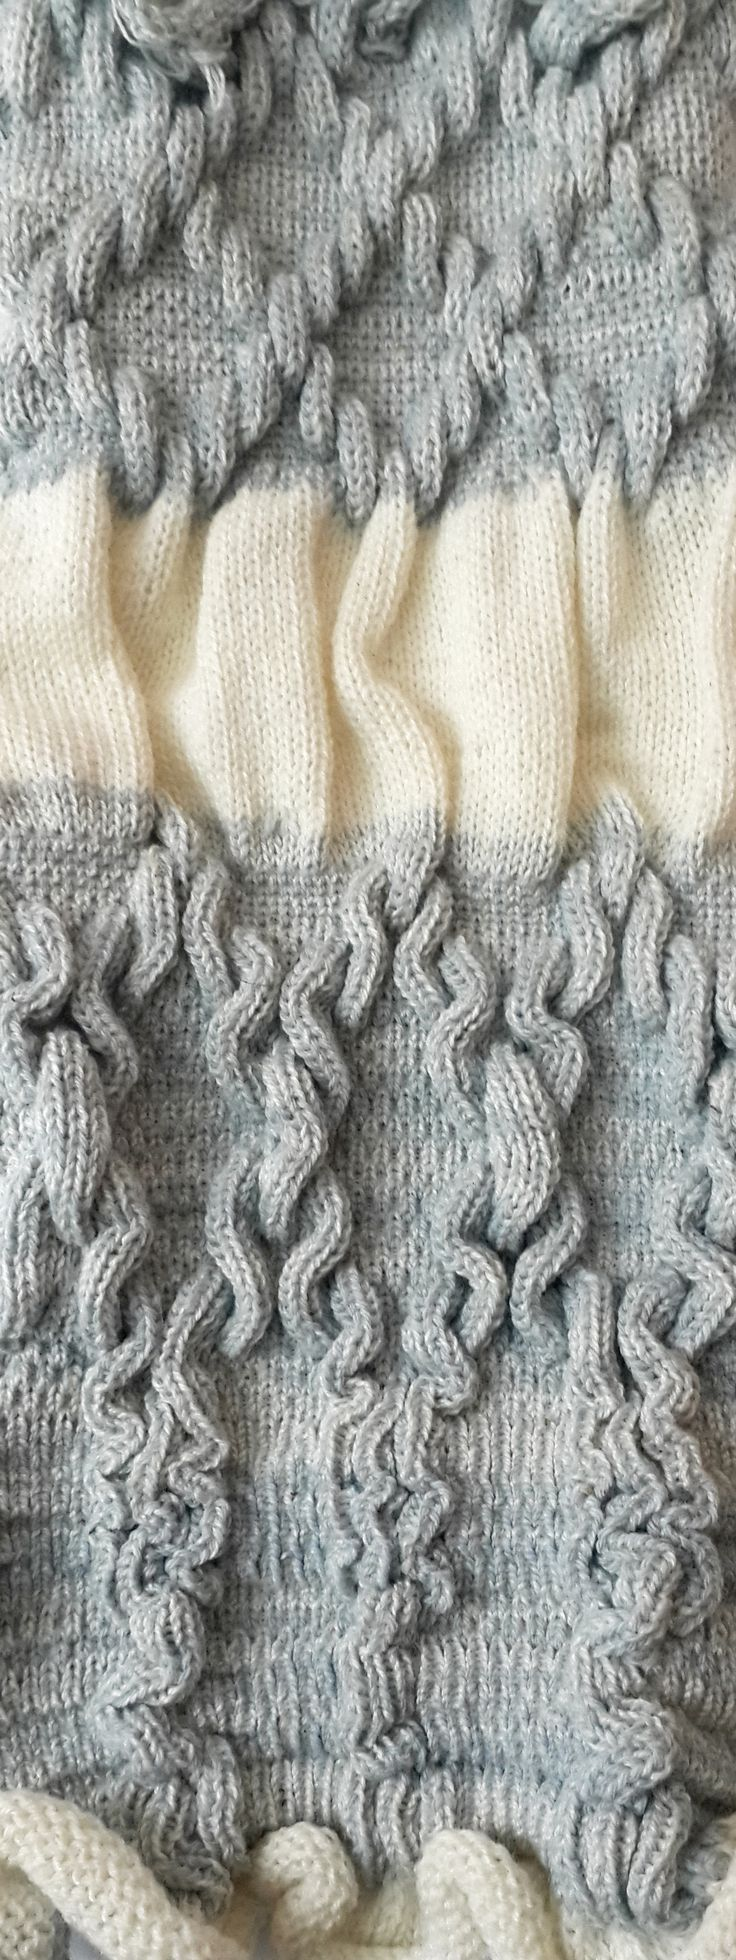 Jacquard swatch, Manual knitting machine, https://tanitusha.wix.com/tatiana-elkind